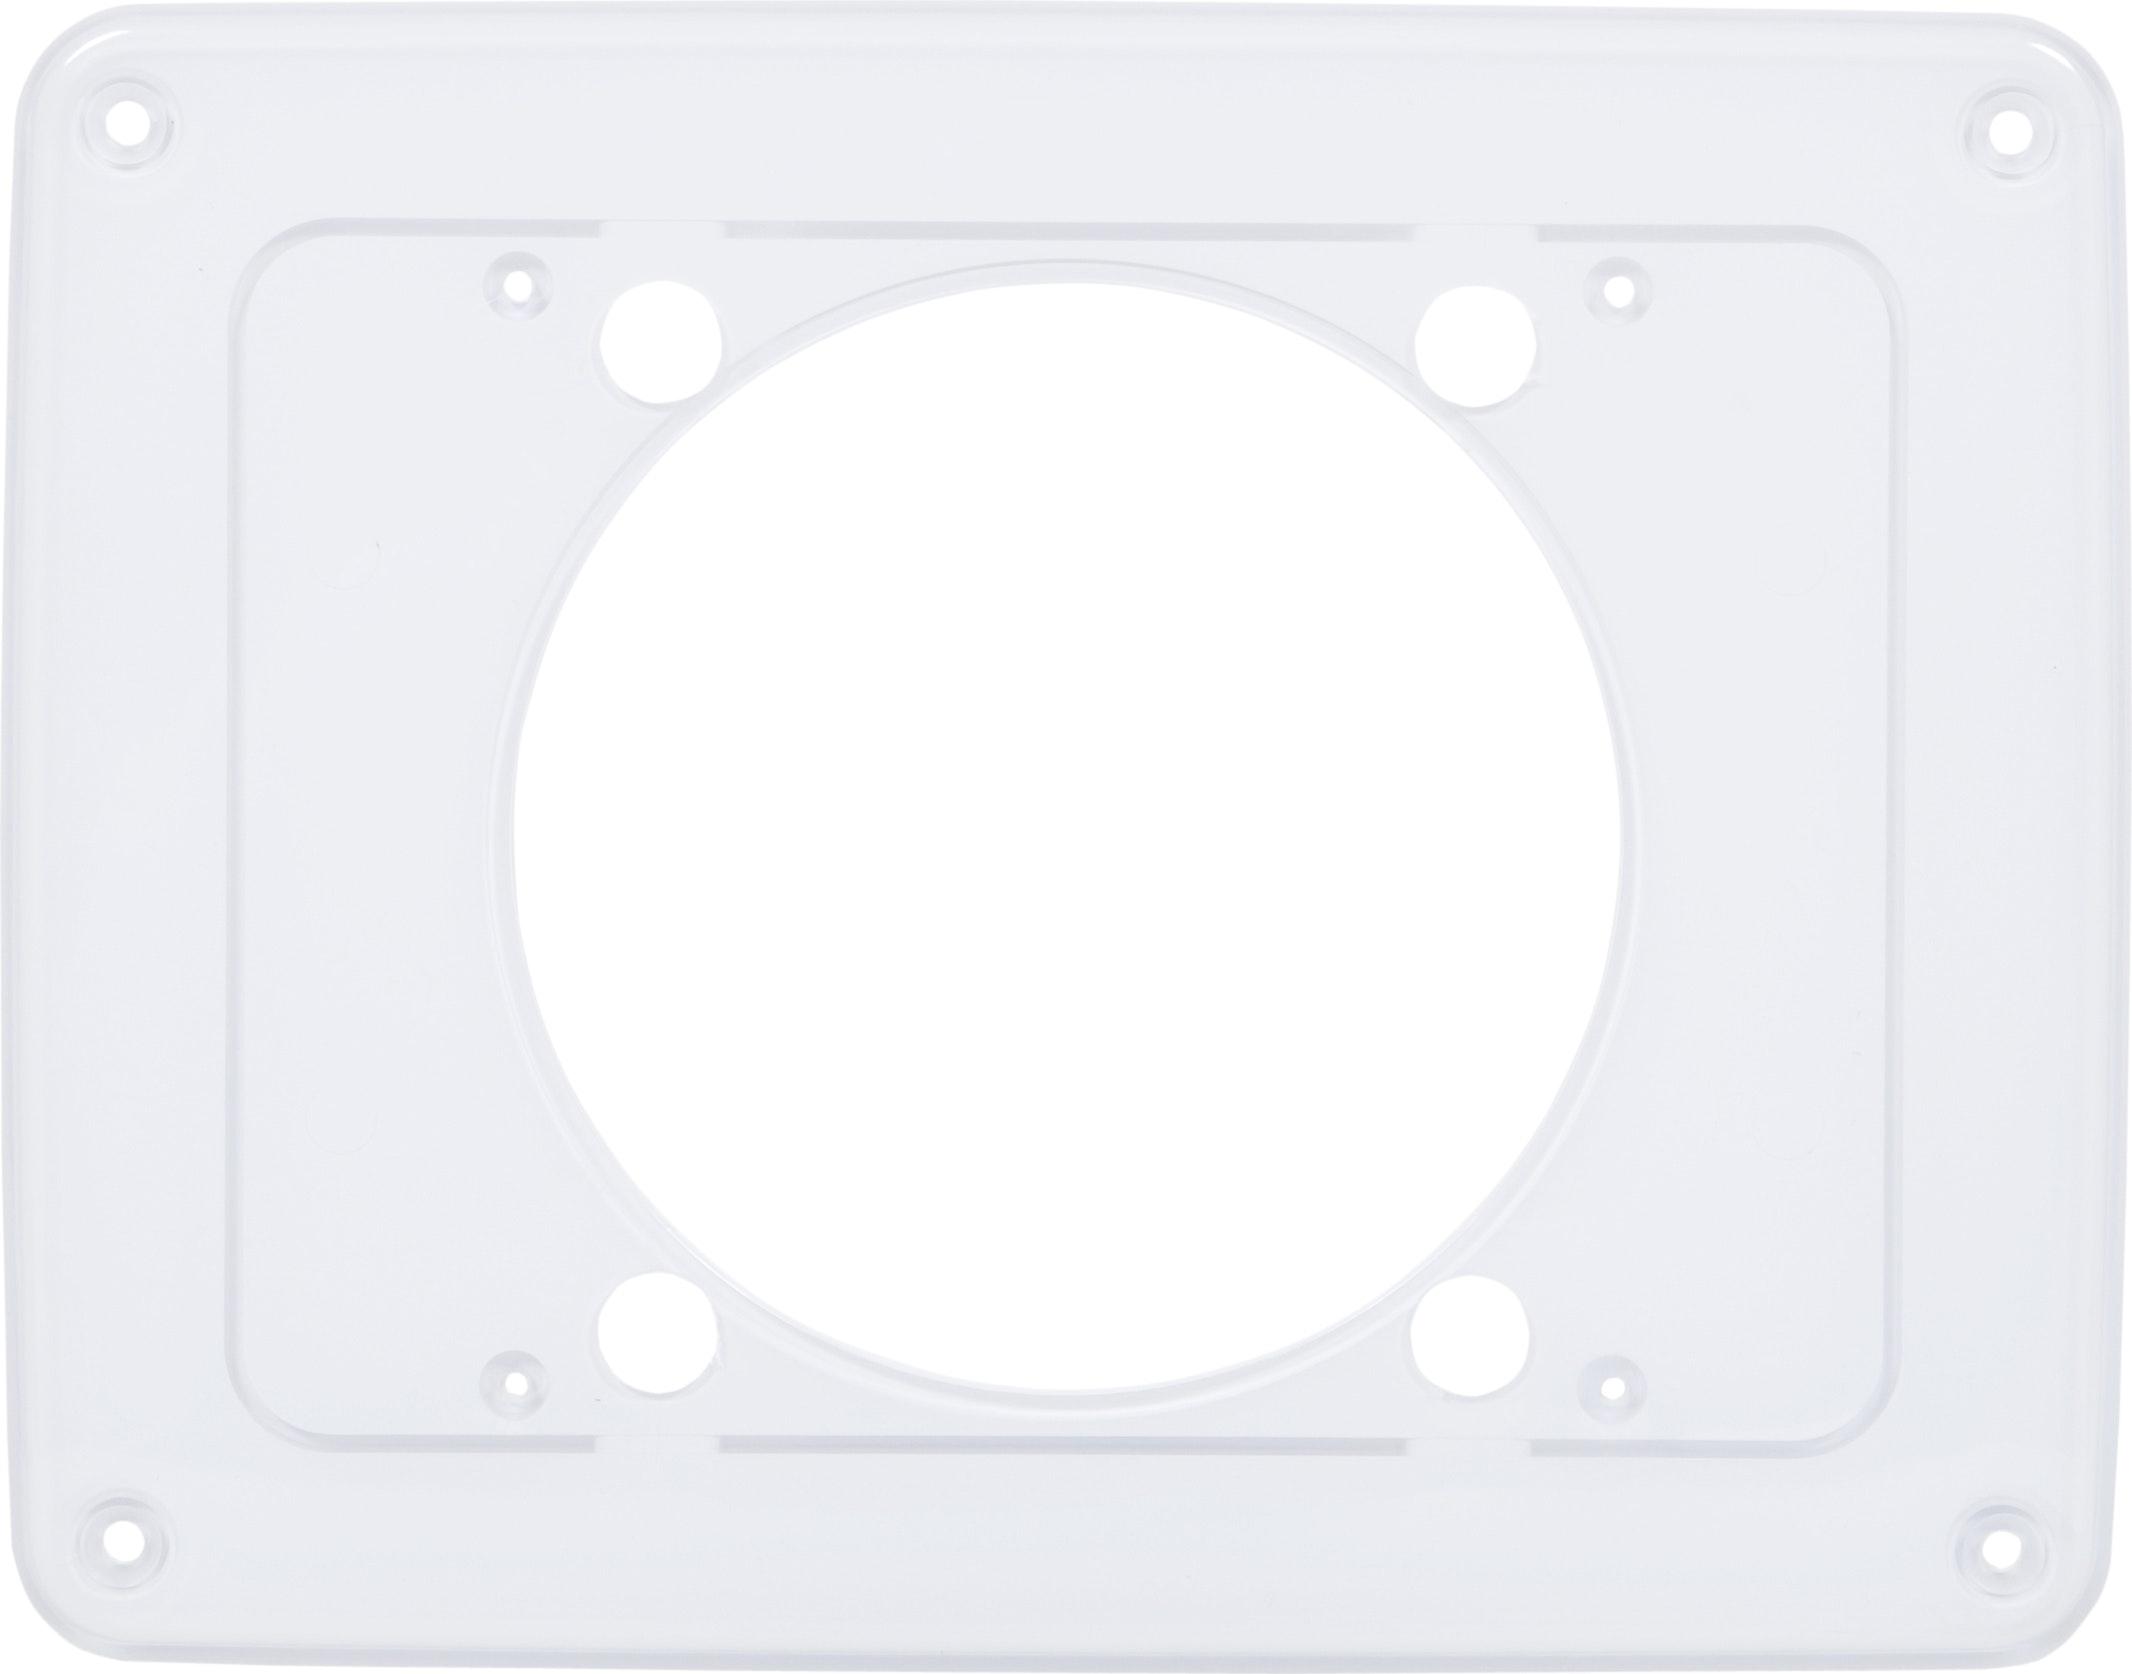 Täckplatta Fresh Badrumsfläkt Intellivent 242x190mm Vit